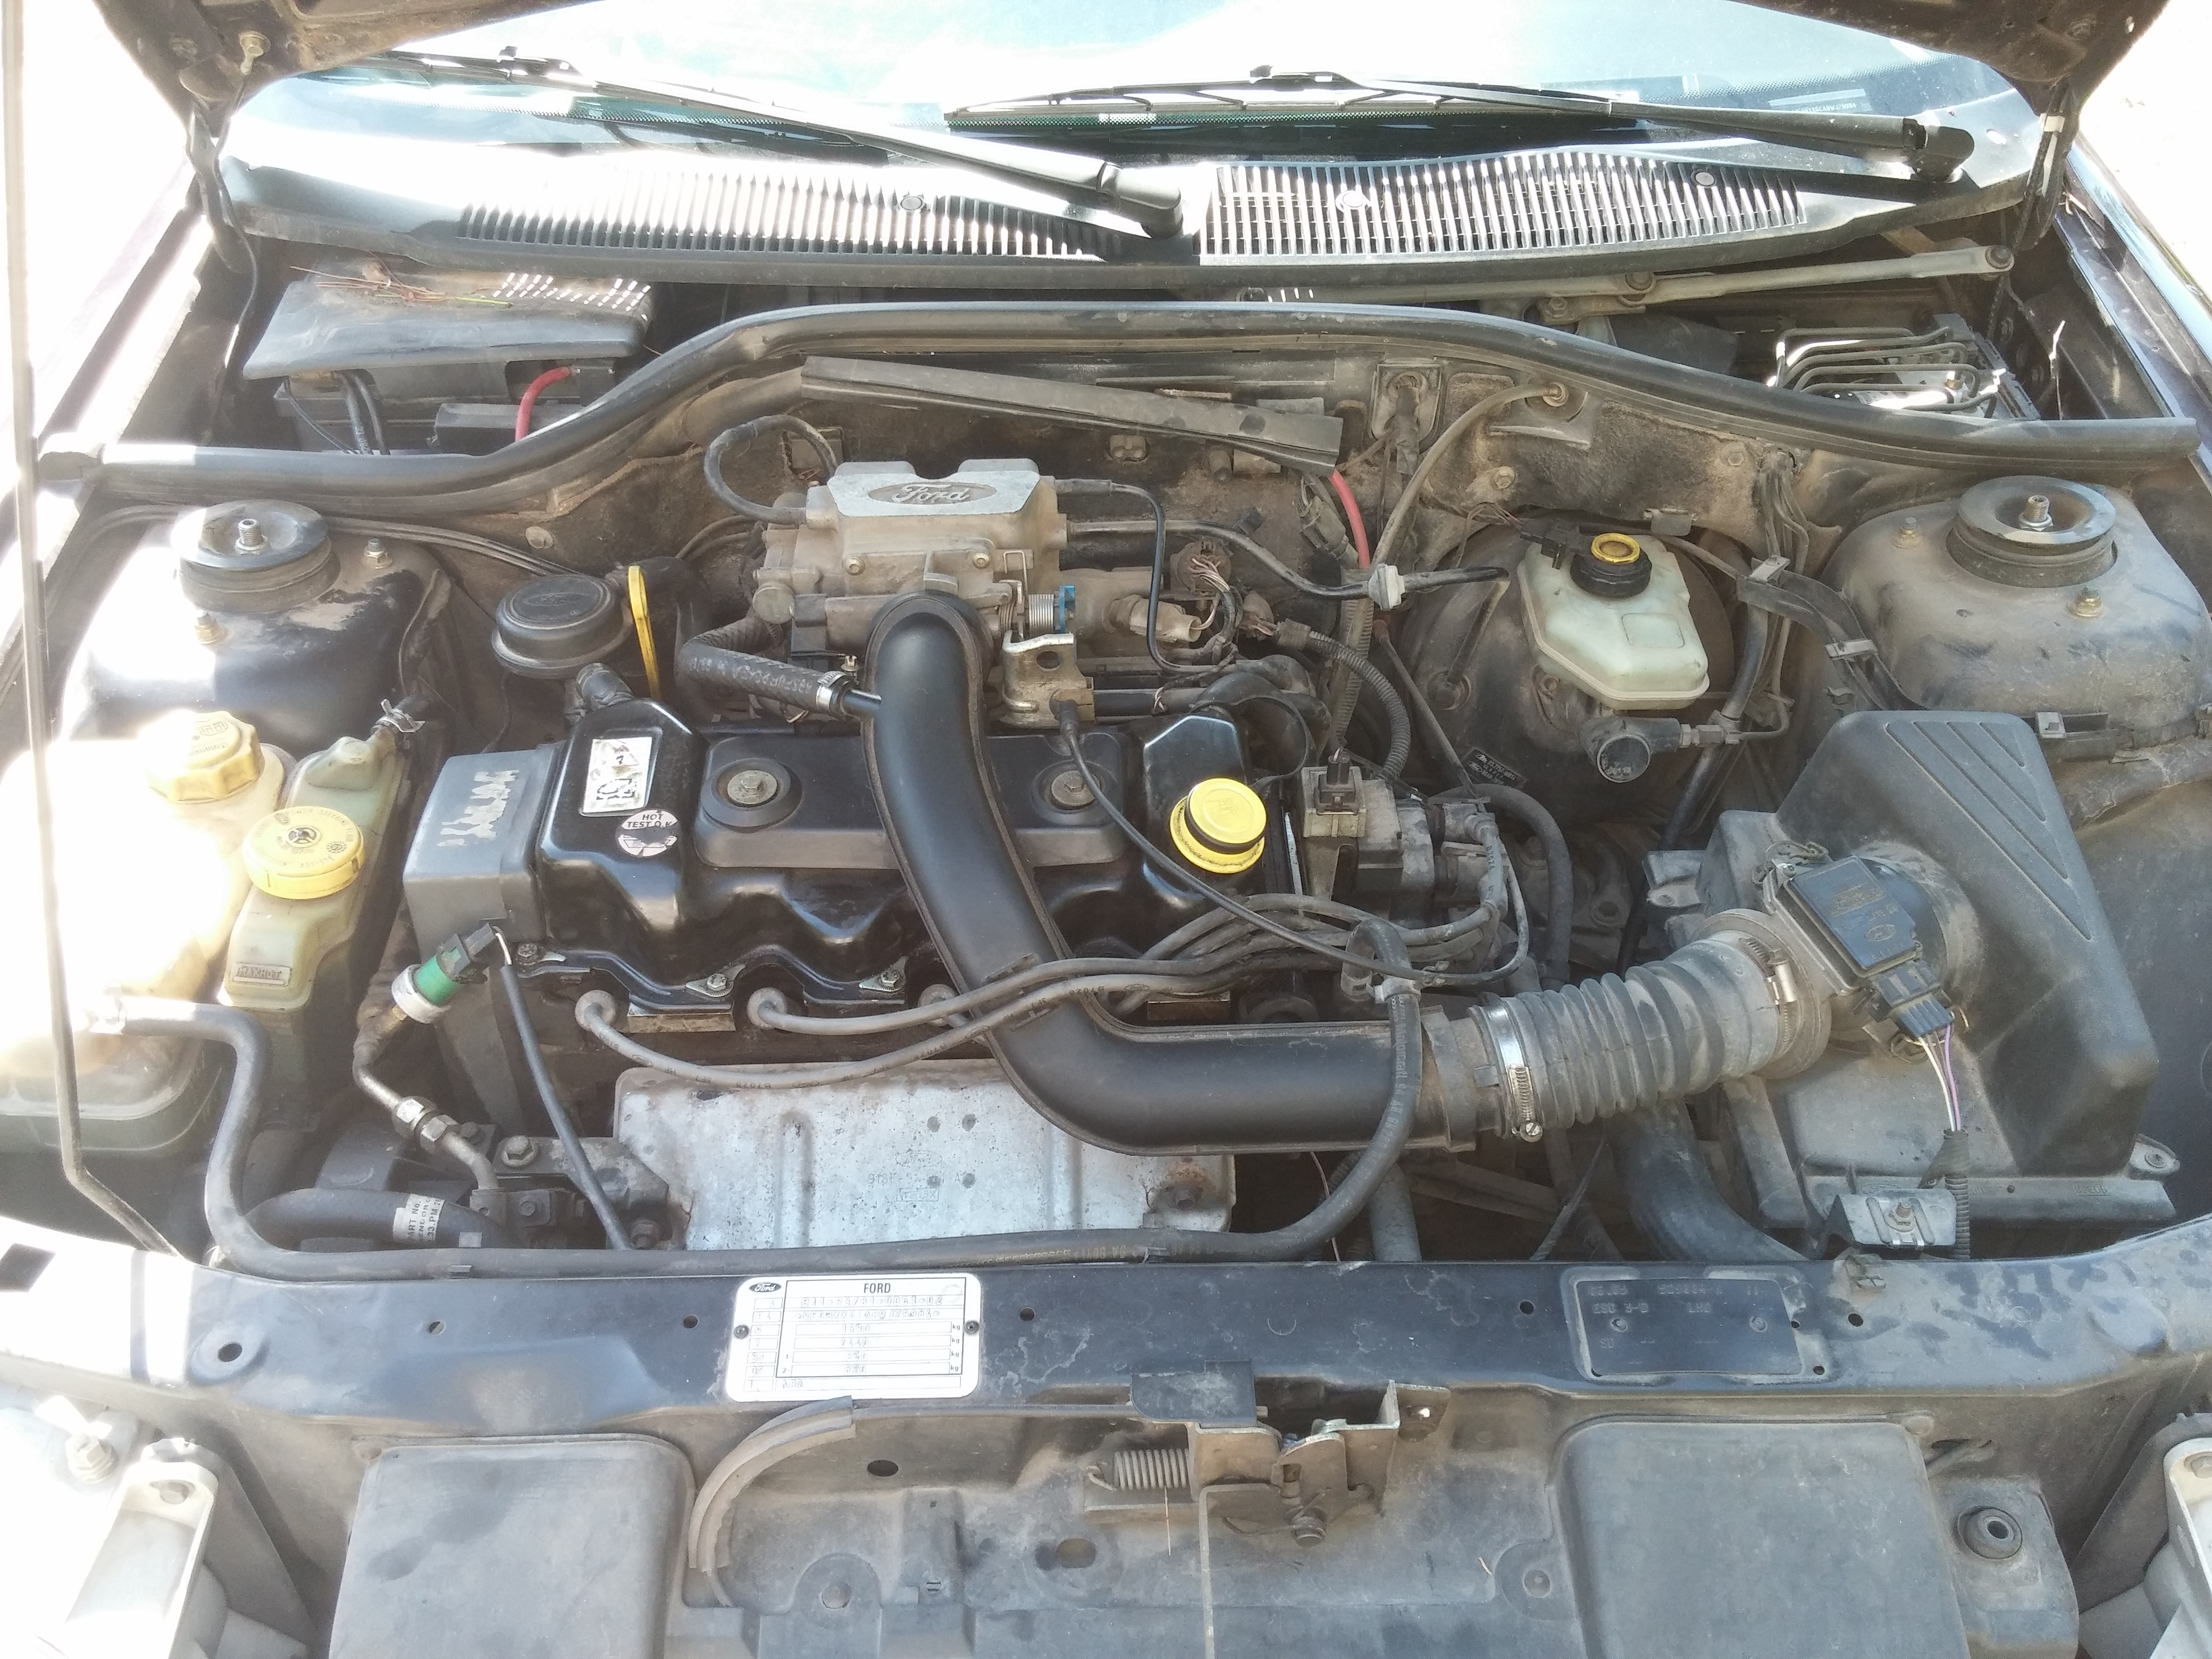 Ford Escort, 1.4i benzin